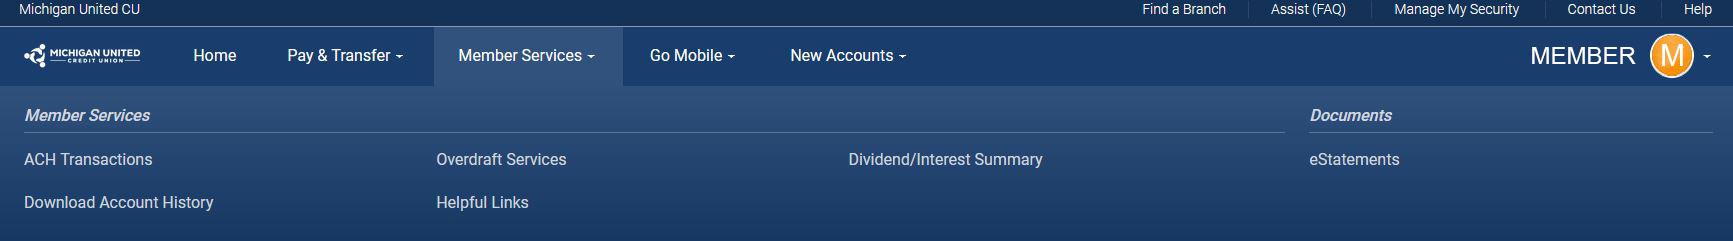 member services screenshot online banking